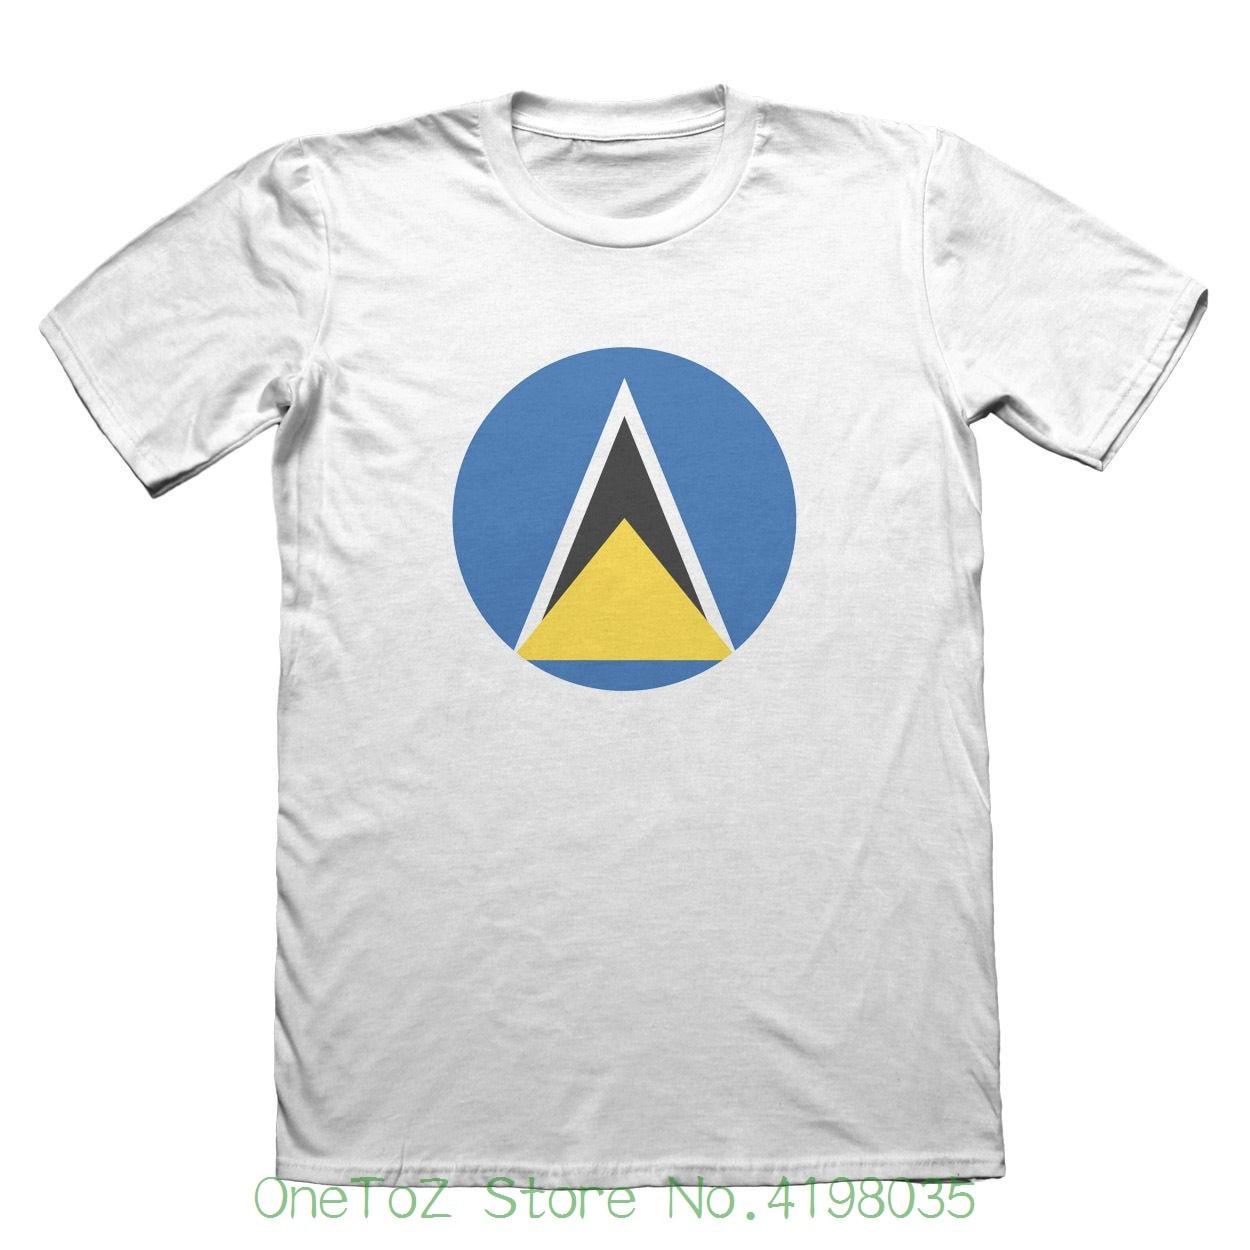 Saint Lucia Flag T-shirt - Mens Fathers Day Christmas #9068 Summer Style Hip Hop Men T-shirt Tops